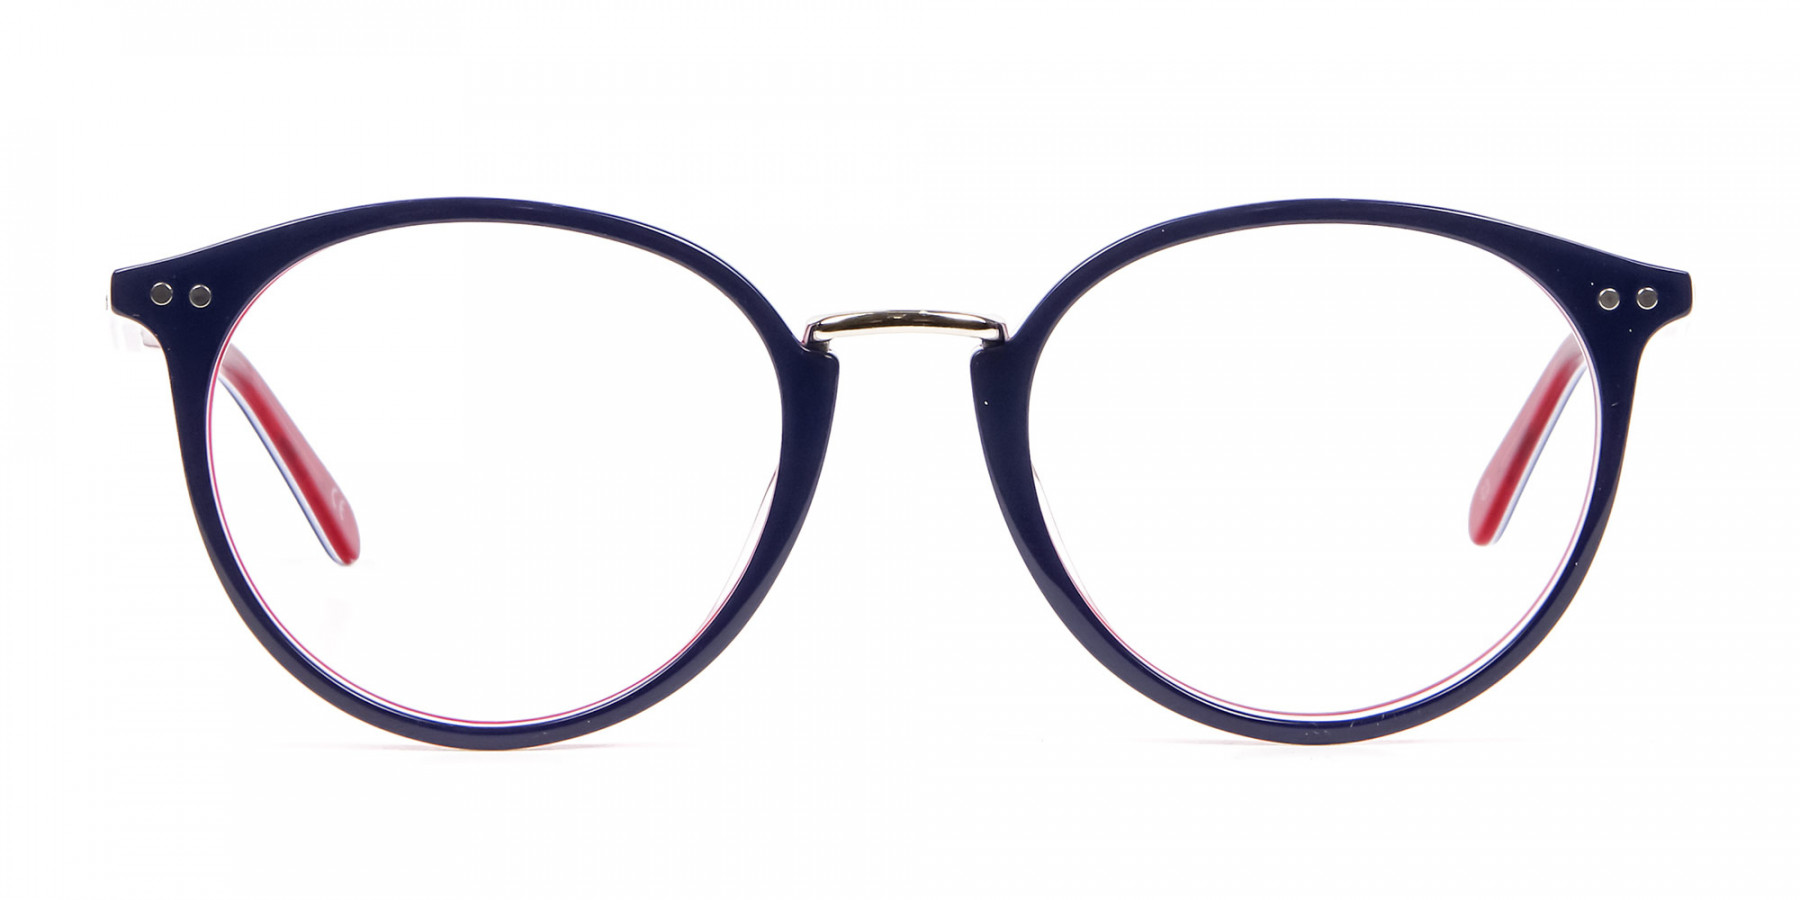 Navy Blue & Red Glasses